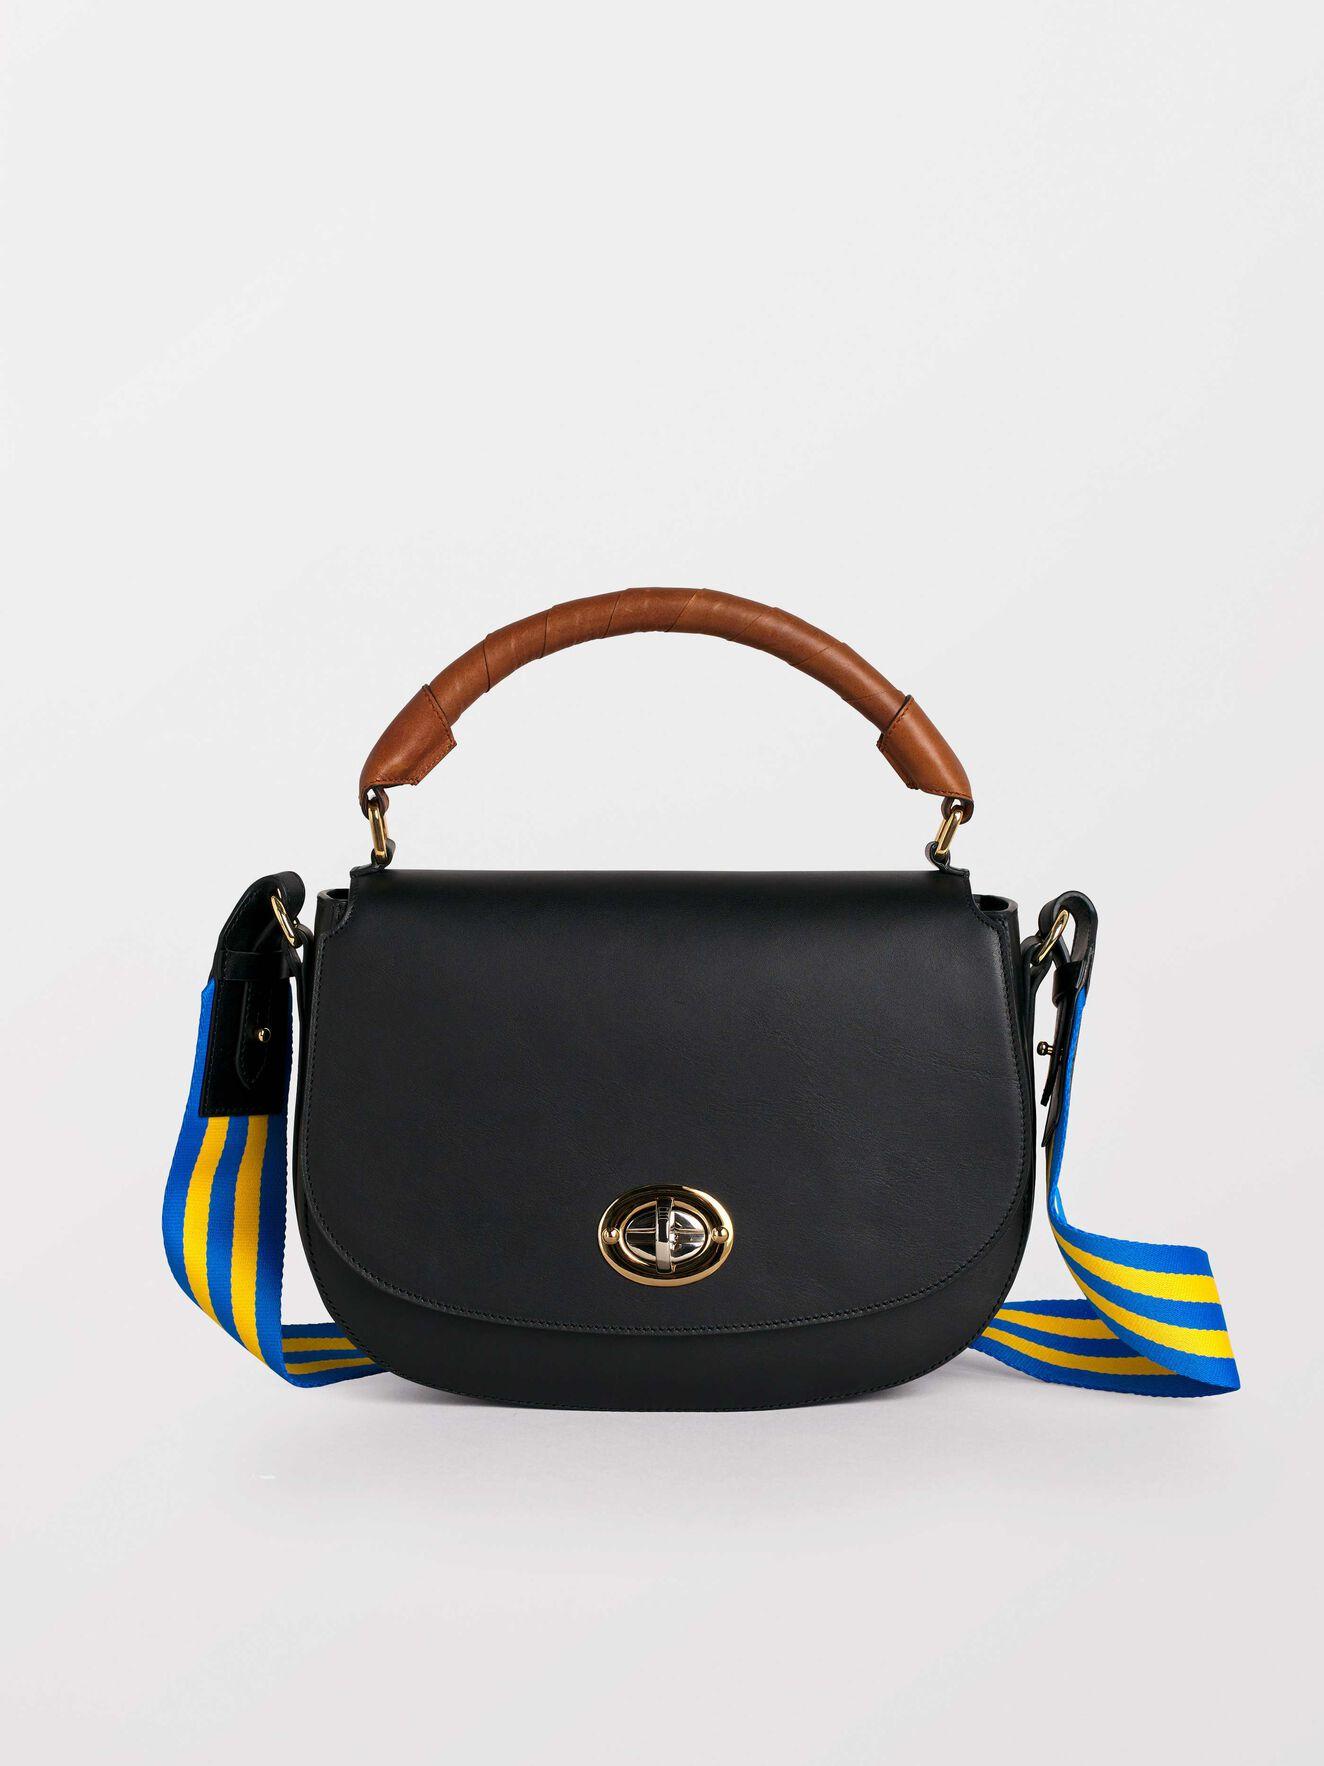 Borsetta Bag in Black from Tiger of Sweden